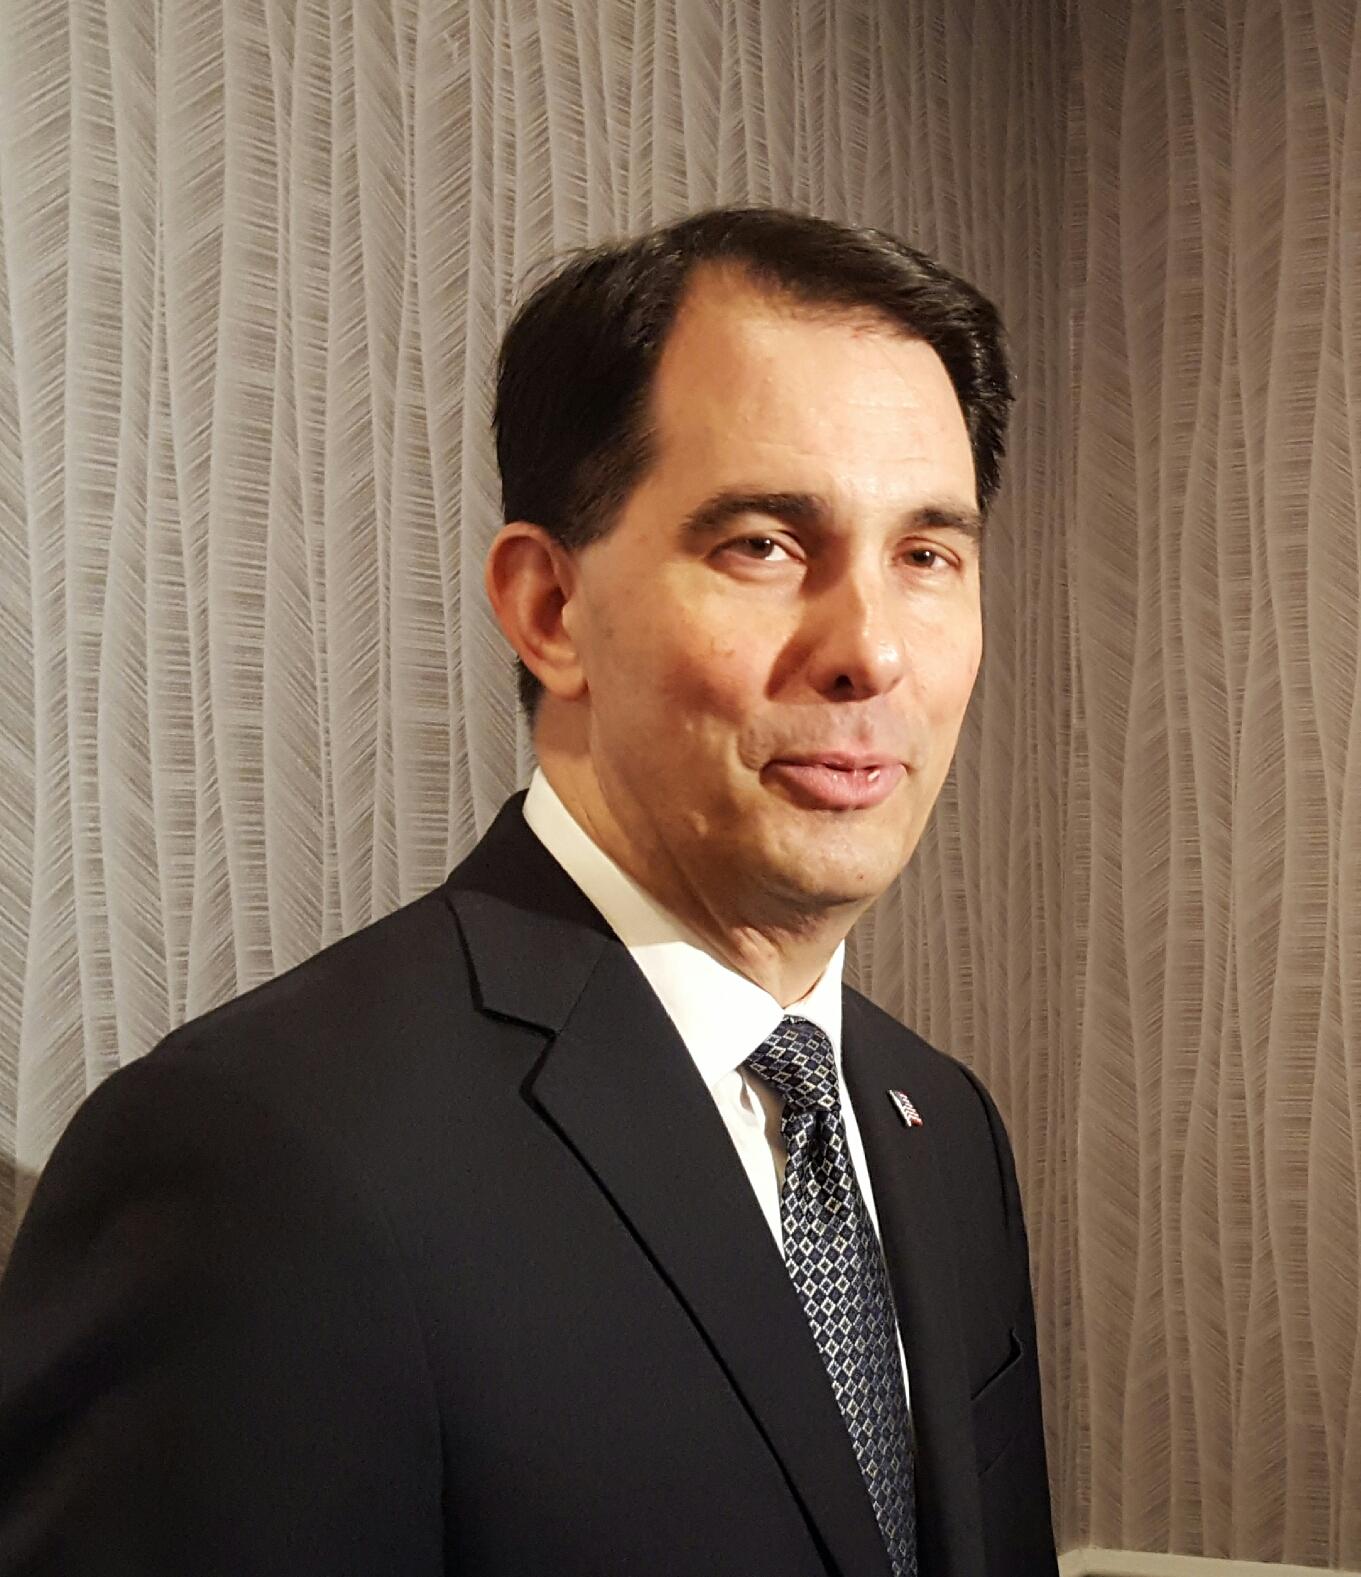 Walker to sign CBD oil, Project Labor Agreement bills